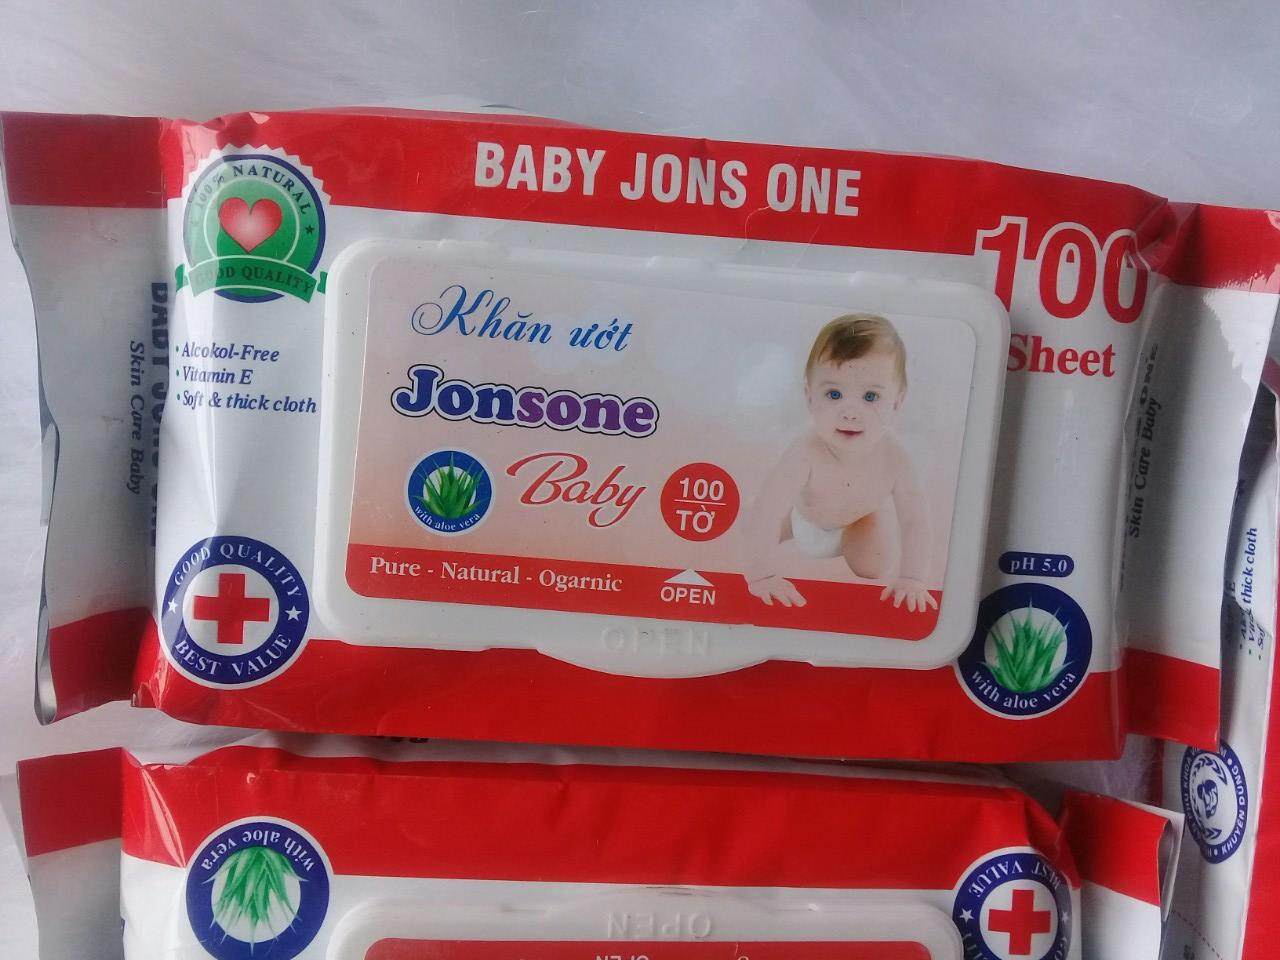 KHĂN ƯỚT JONSONE BABY 100 TỜ